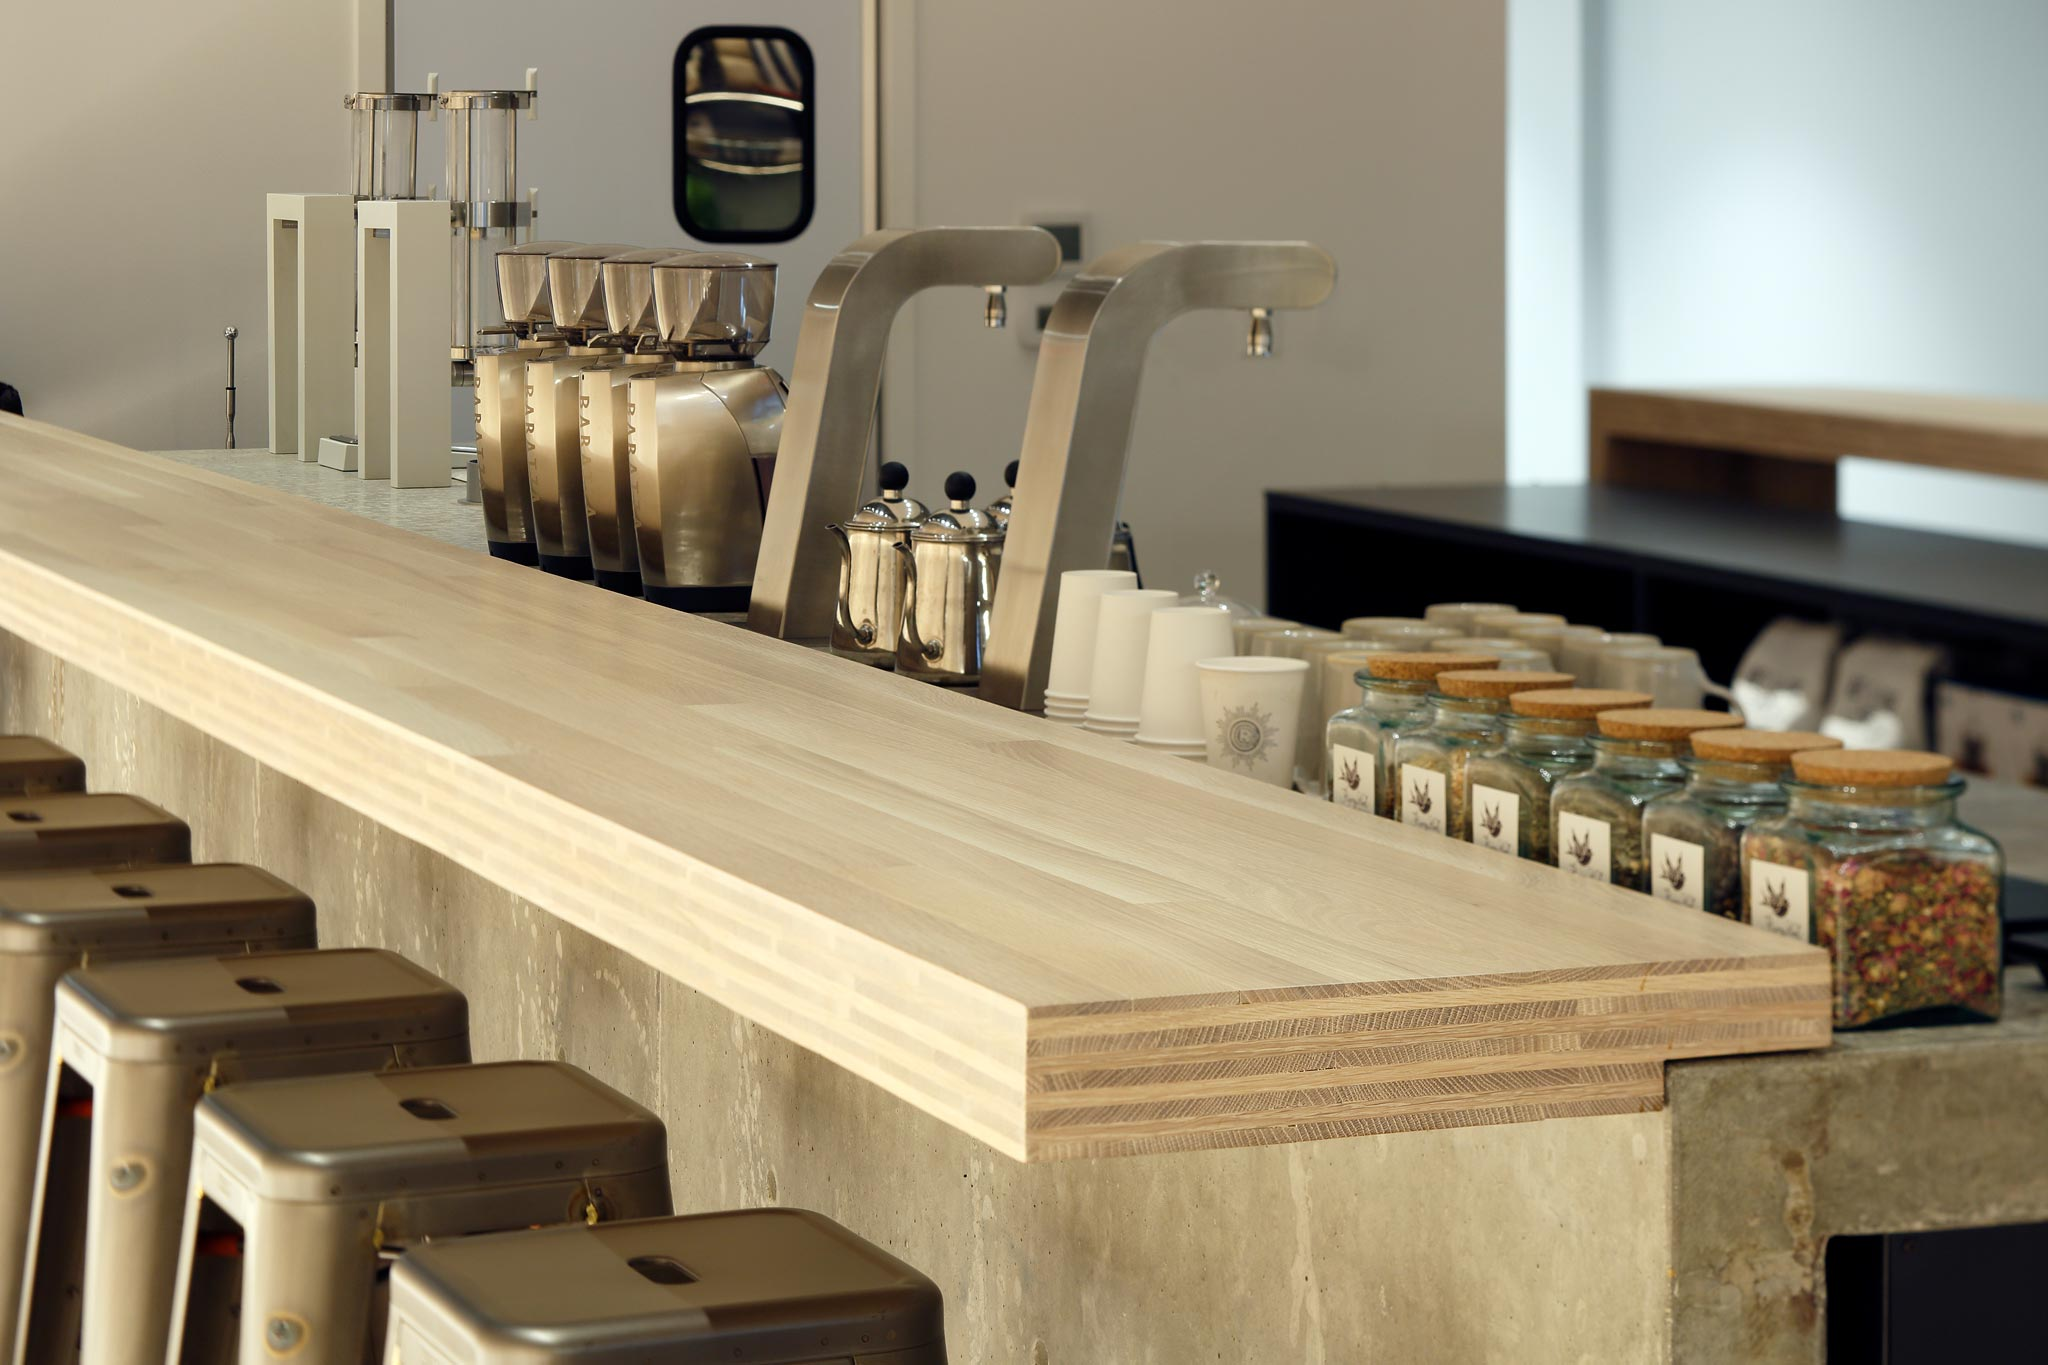 Revelator Birmingham modern coffee shop inside view of bar